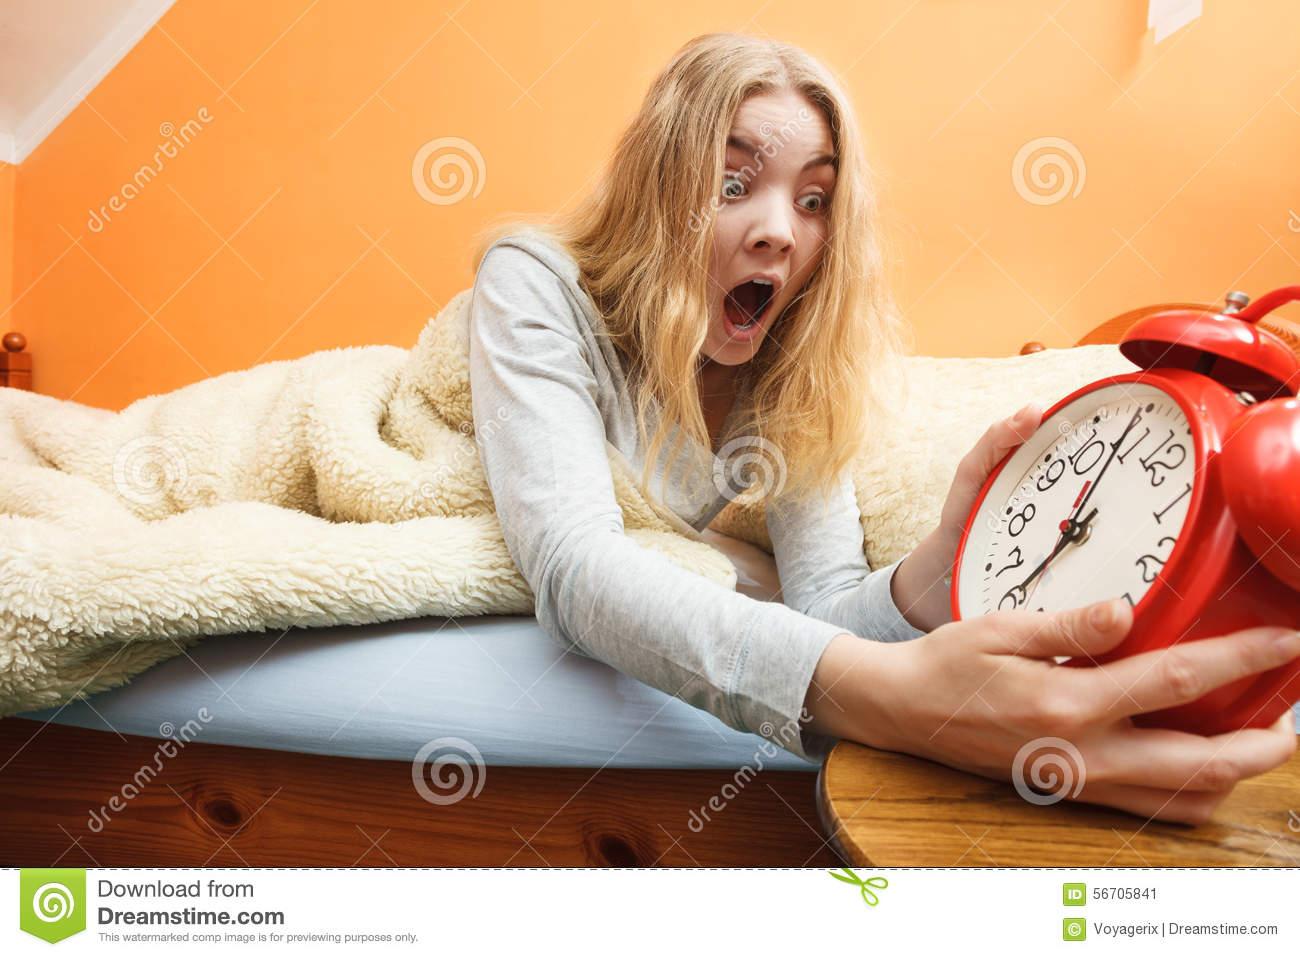 Clipart woman turning off alarm clip art black and white stock Turning Off An Alarm Clock Stock Photo - Image: 20288390 clip art black and white stock